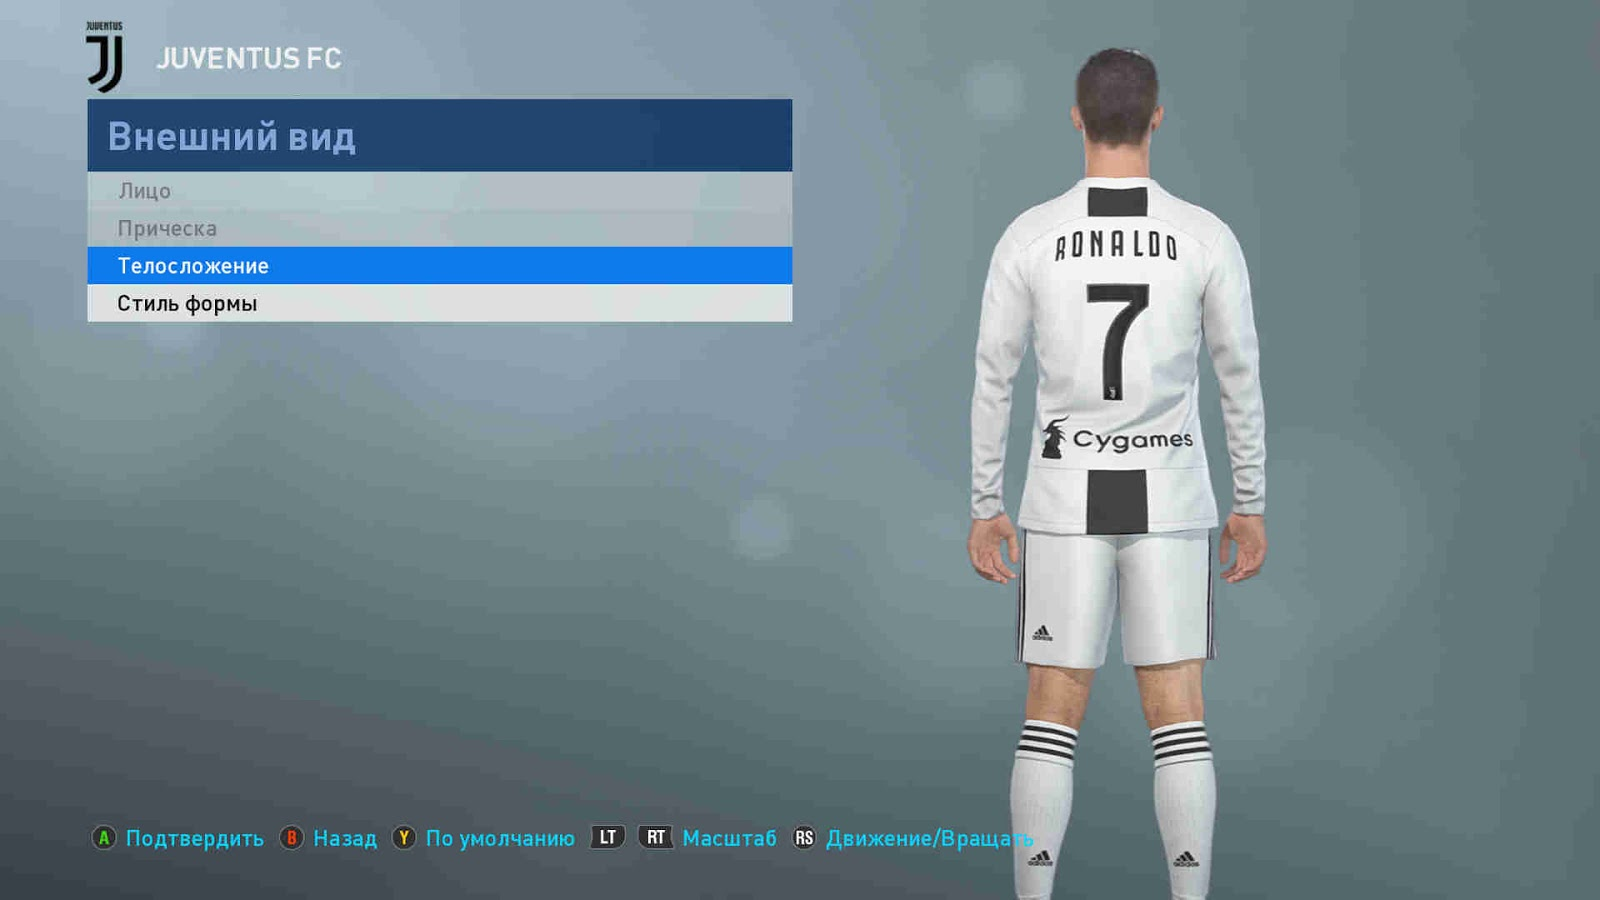 Fifa11 патч на форму ювентуса